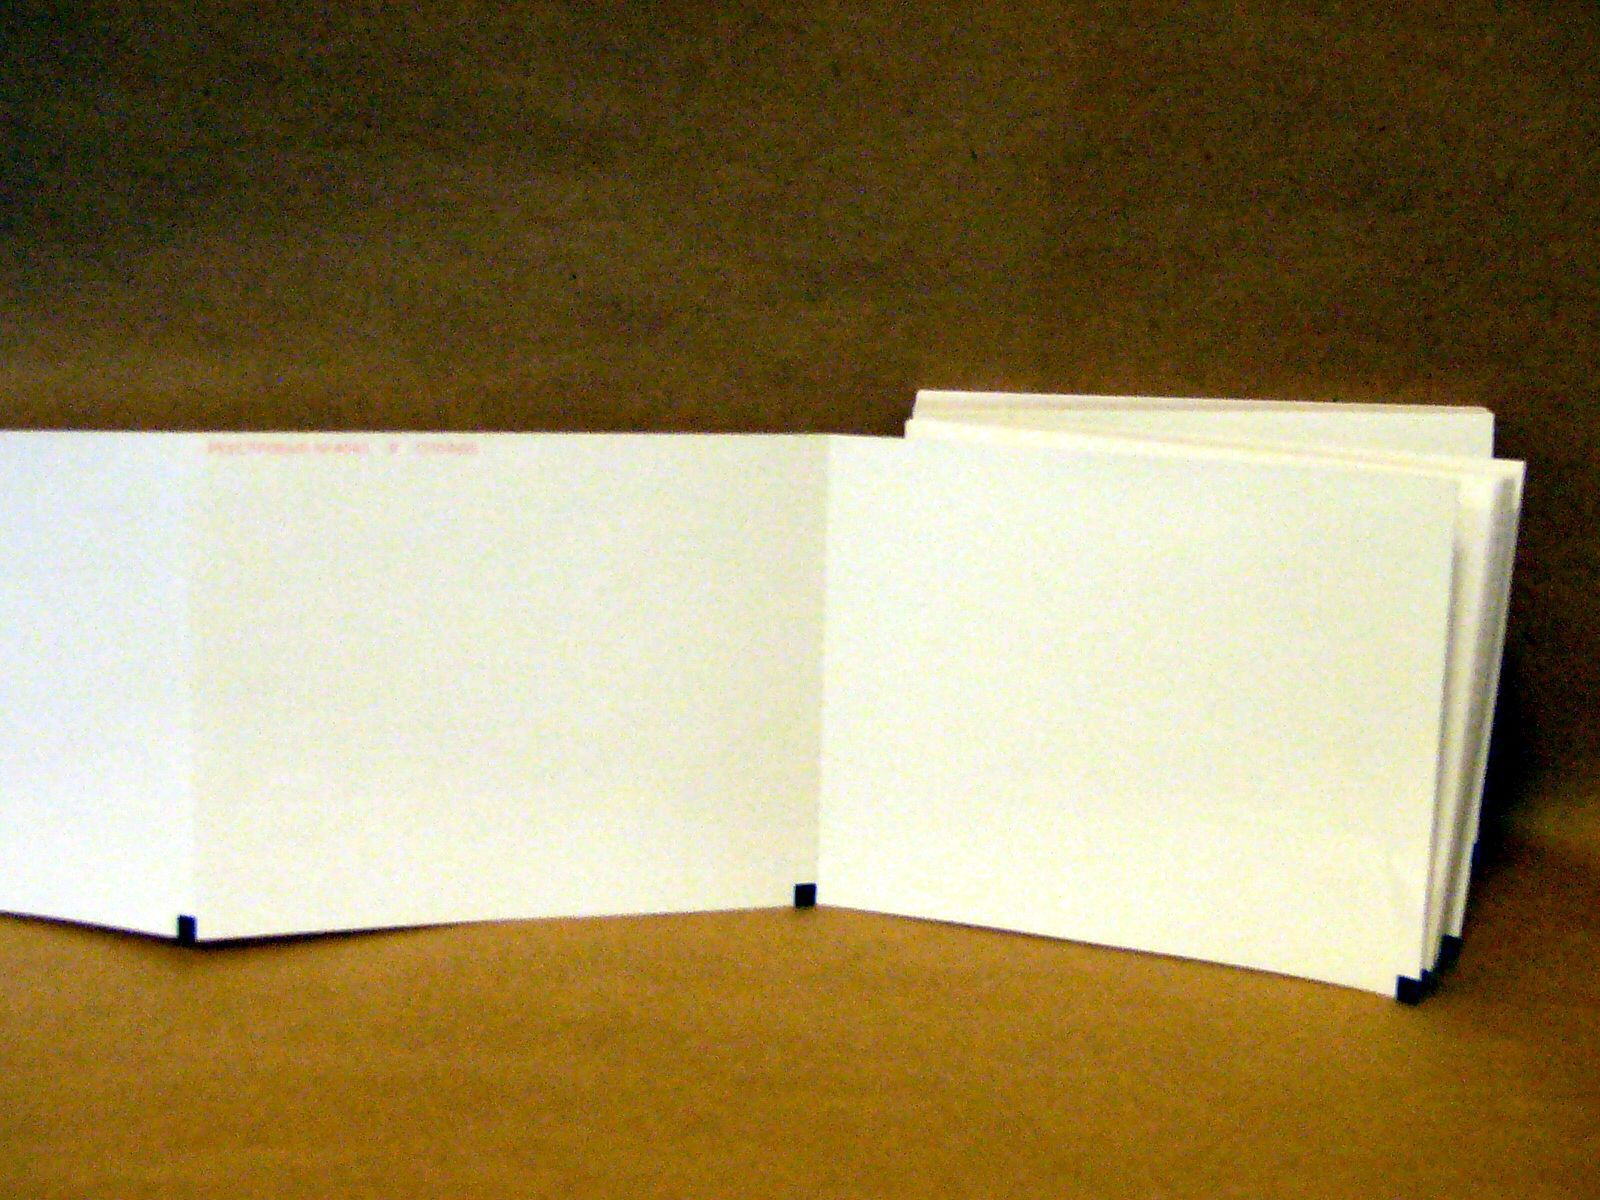 110х150х300, бумага ЭЭГ для Nihon Kohden Neuropack 2, реестр 4041